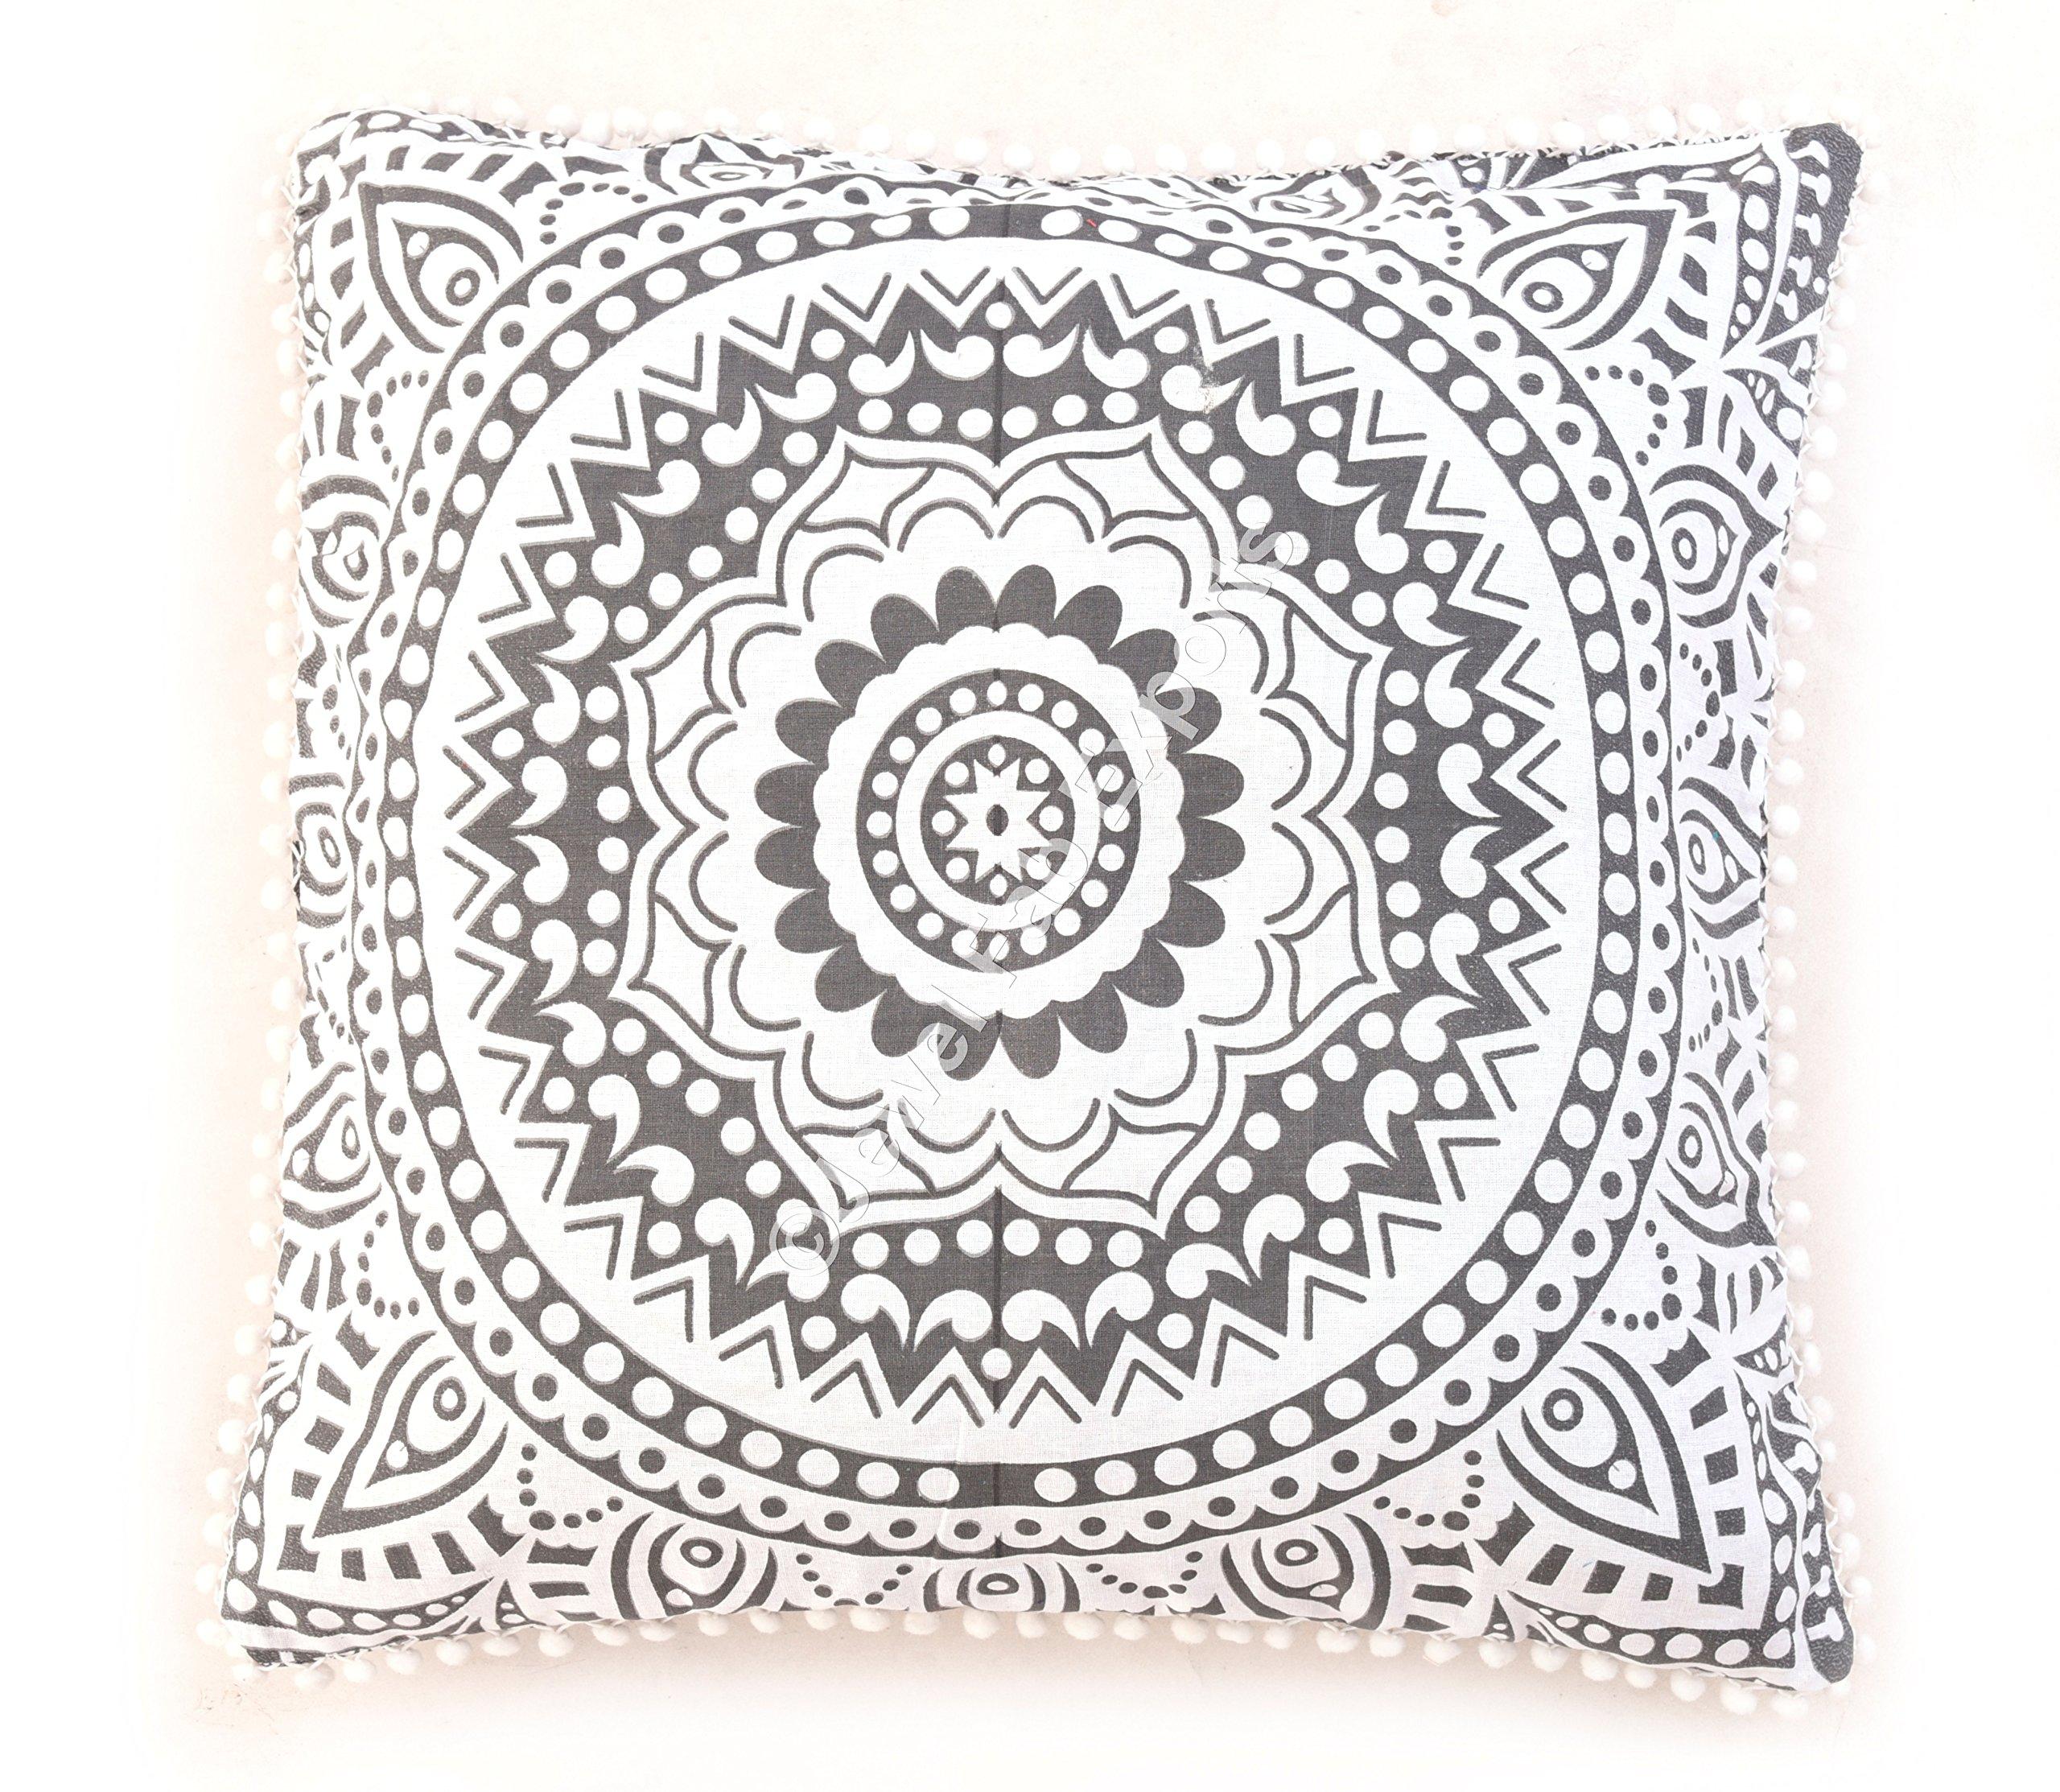 Indian Wholesale 10 Piece Mandala Cushion Cover ,Boho Throw ,Gray Ombre Mandala Cushion Covers ,large Euro Pillow Sham, Boho Pillow Cases , Square Pillows Ethnic Cotton Home Decor Cushions